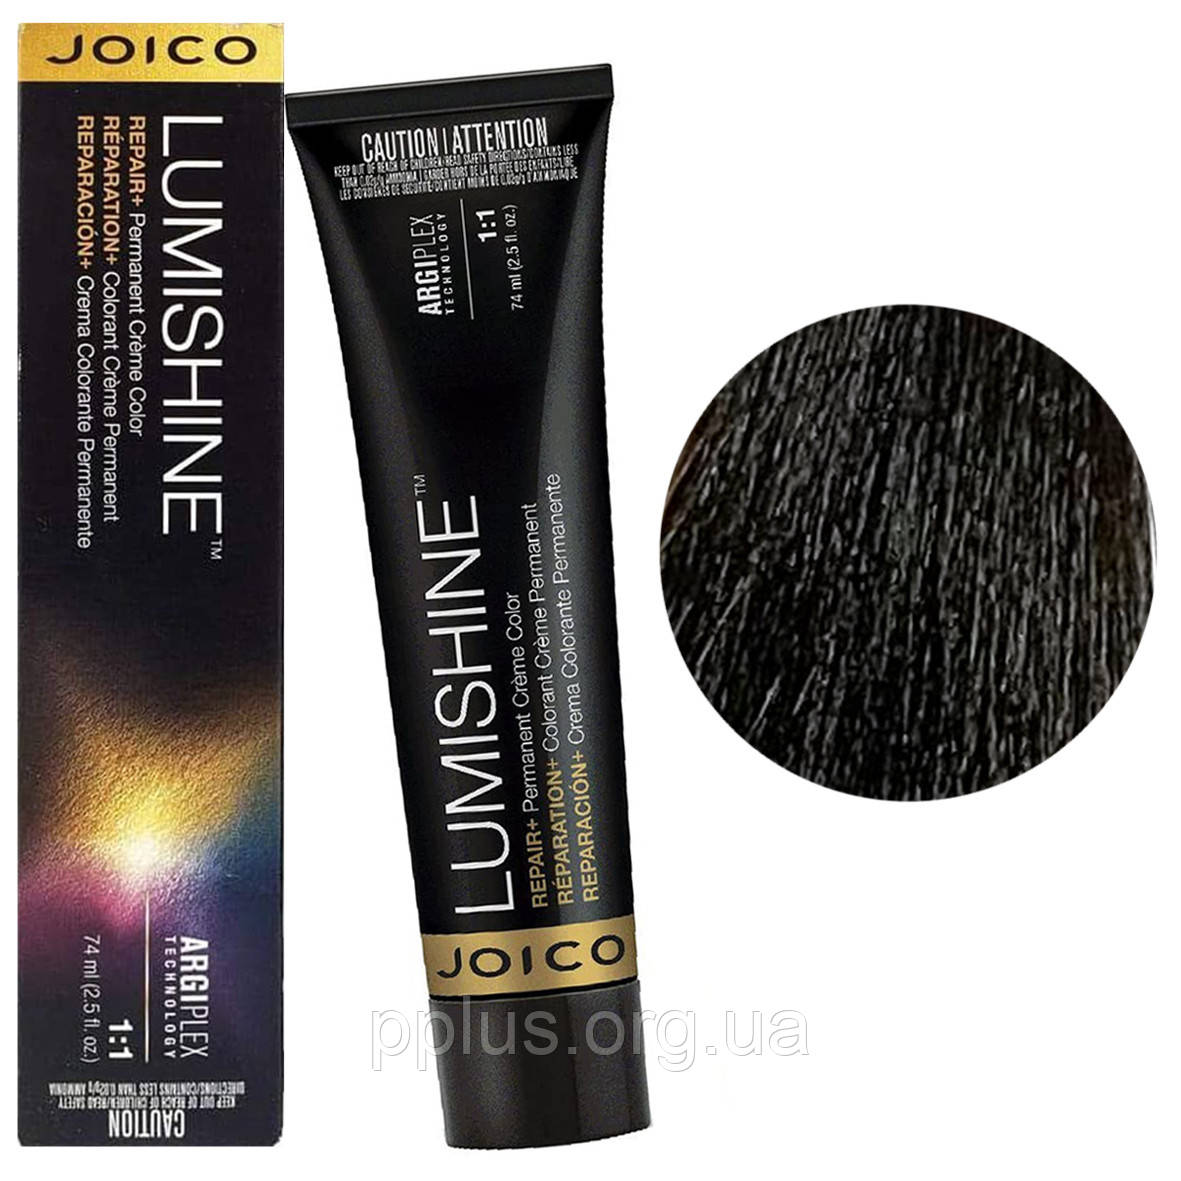 Перманентна крем-фарба для волосся Joico Lumishine Color в асортименті 74 мл 4NG/4.03 Середньо-коричневий